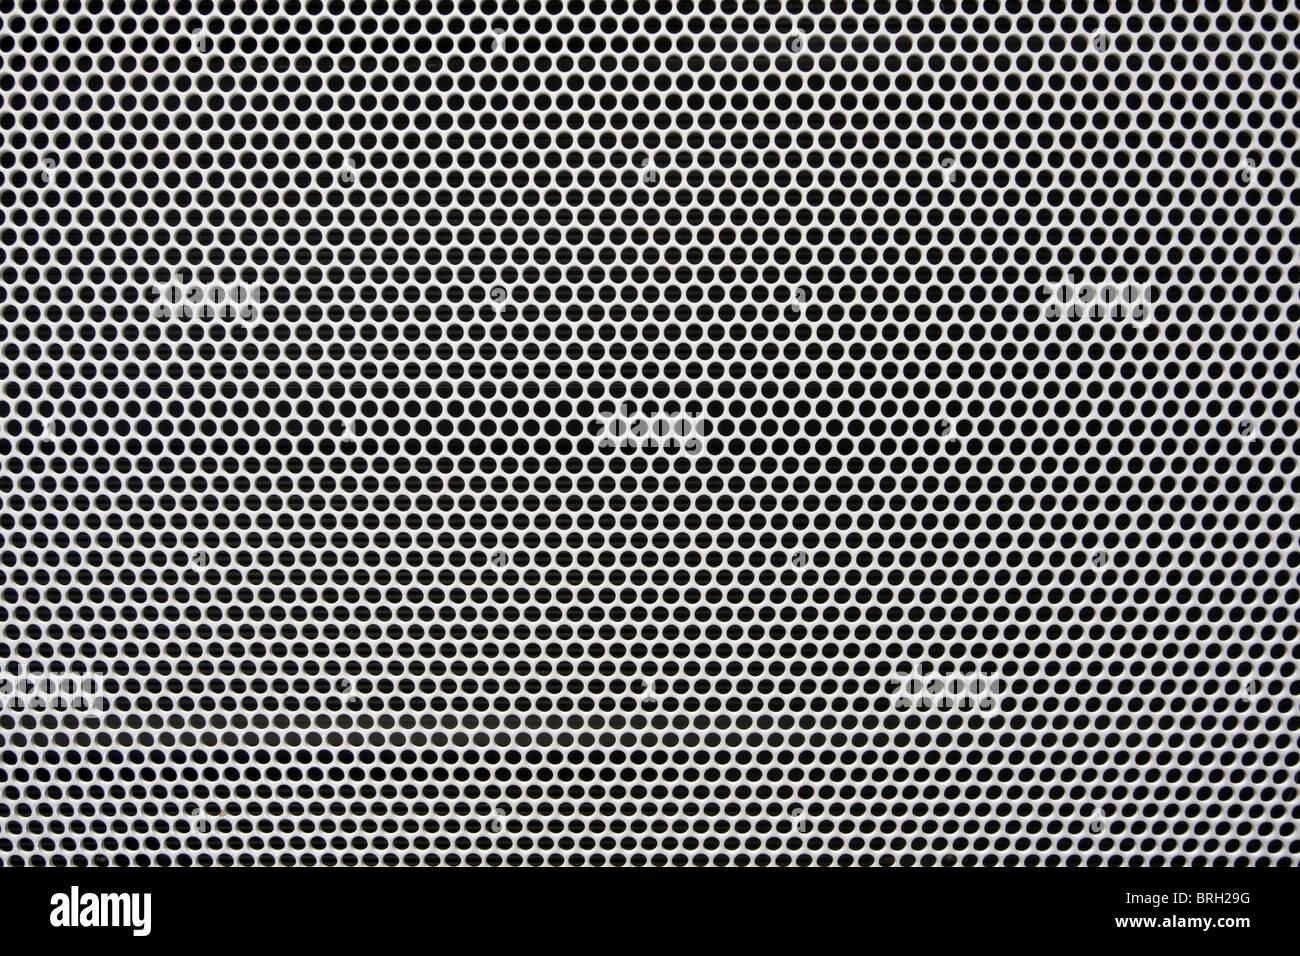 white painted radiator metal grid background - Stock Image